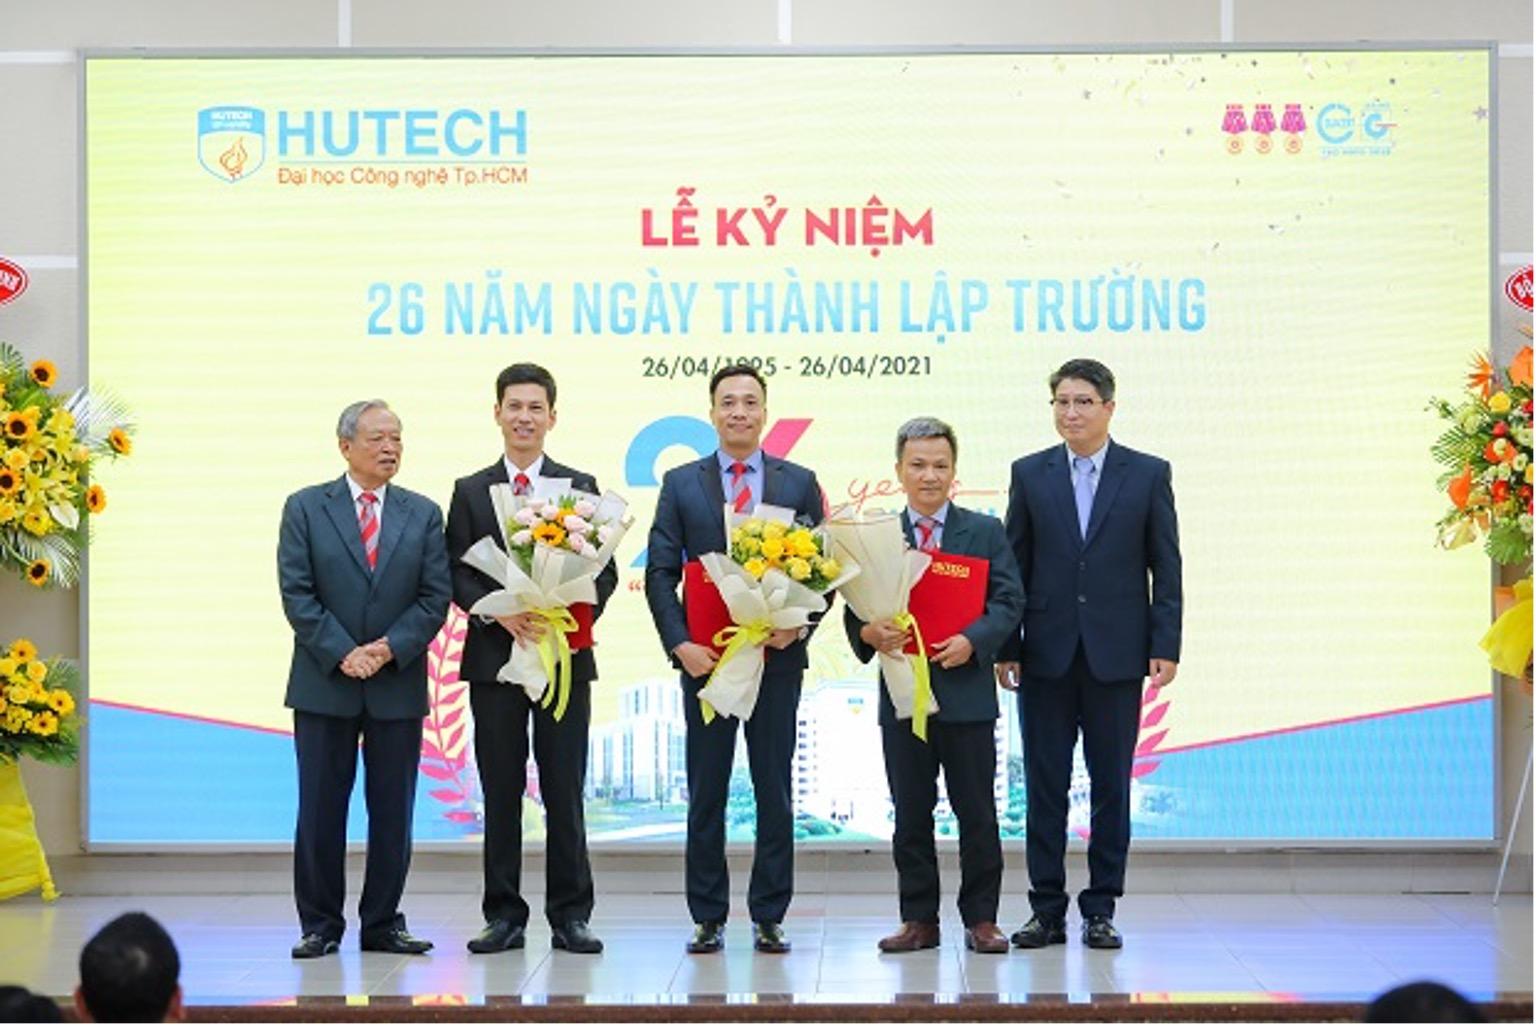 HUTECH launches the Journal of Technology & Innovation (JTIN)